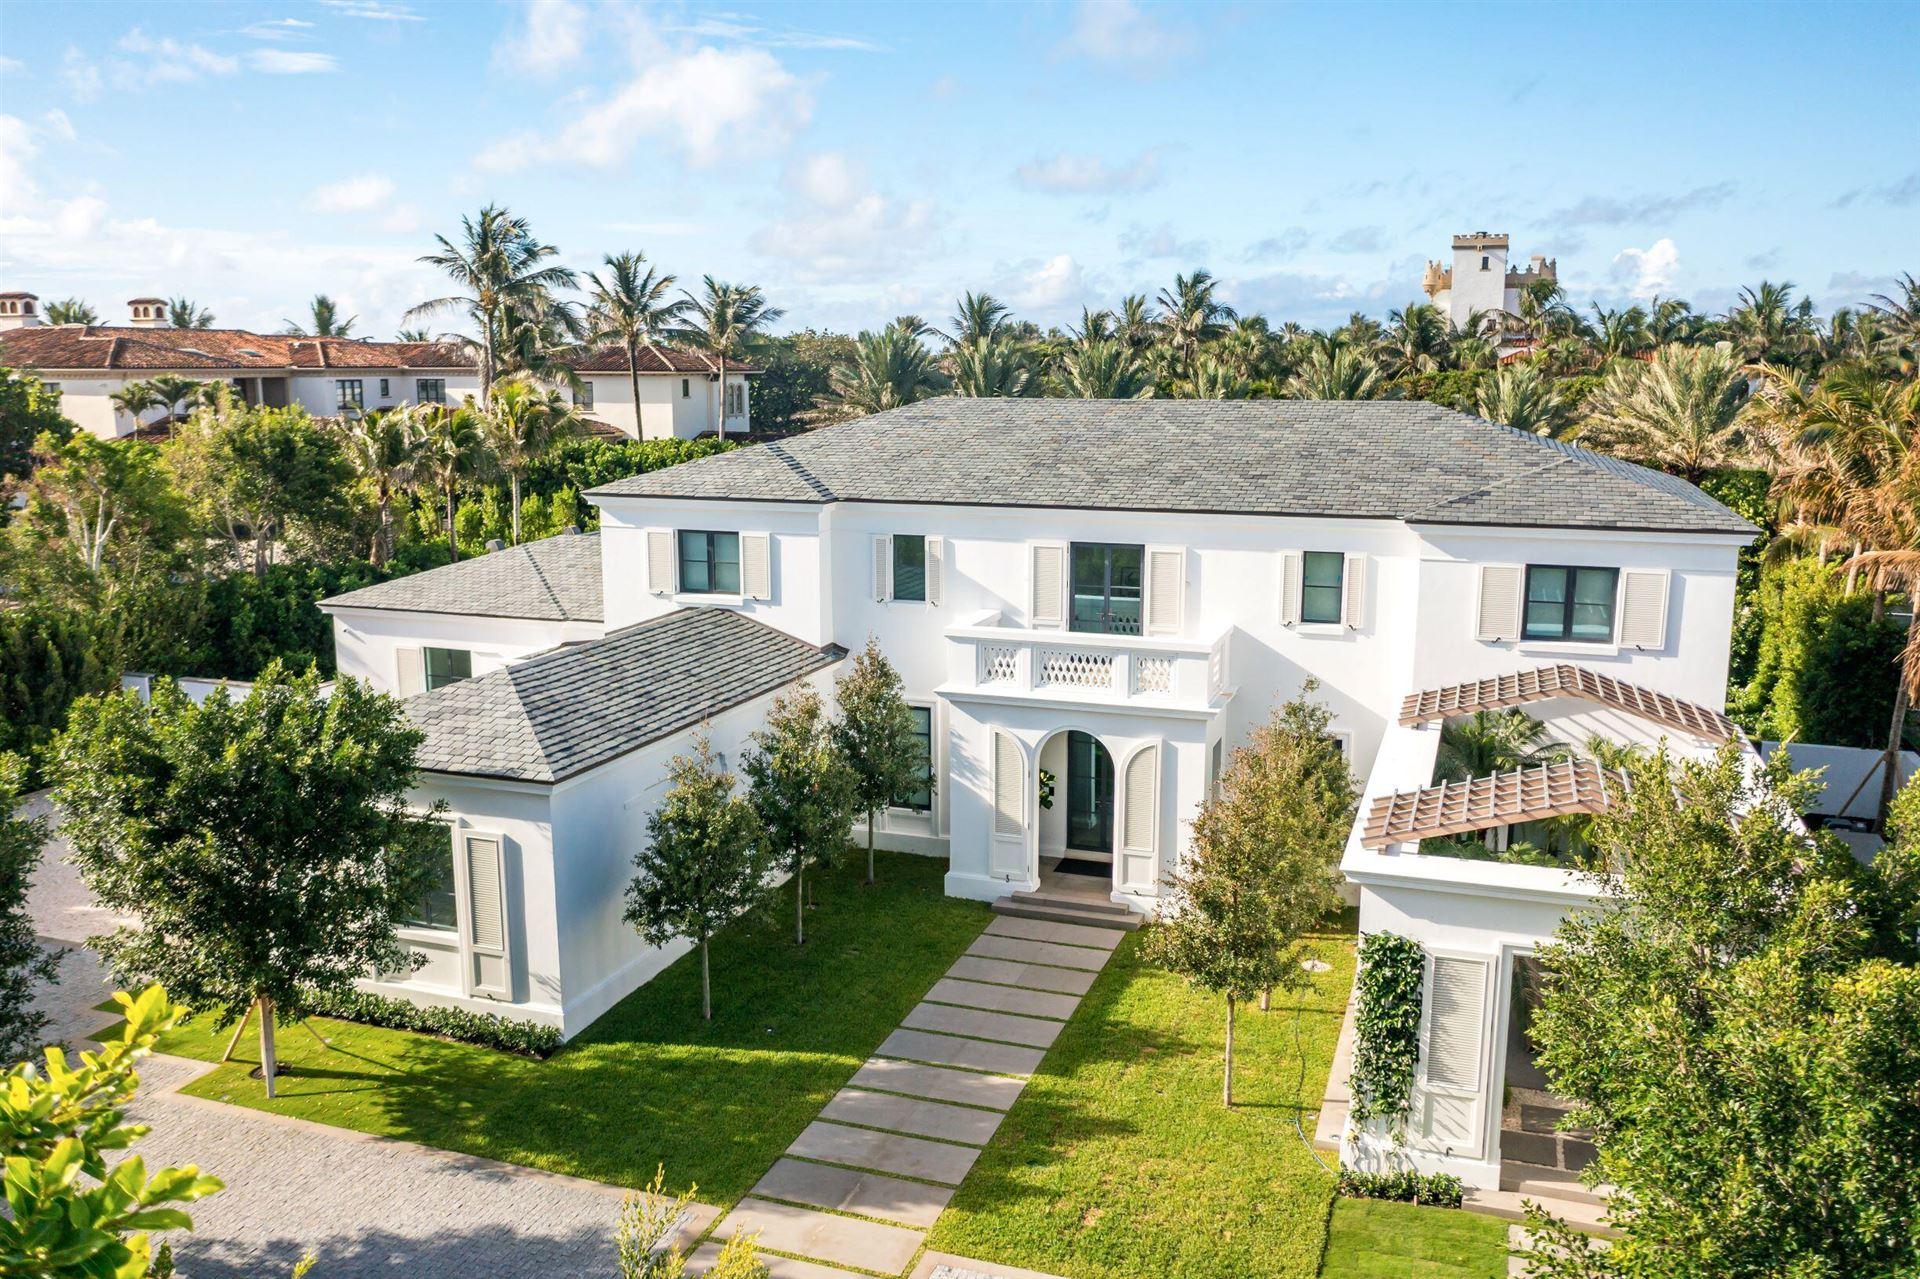 95 Middle Road                                                                               Palm Beach                                                                      , FL - $28,750,000